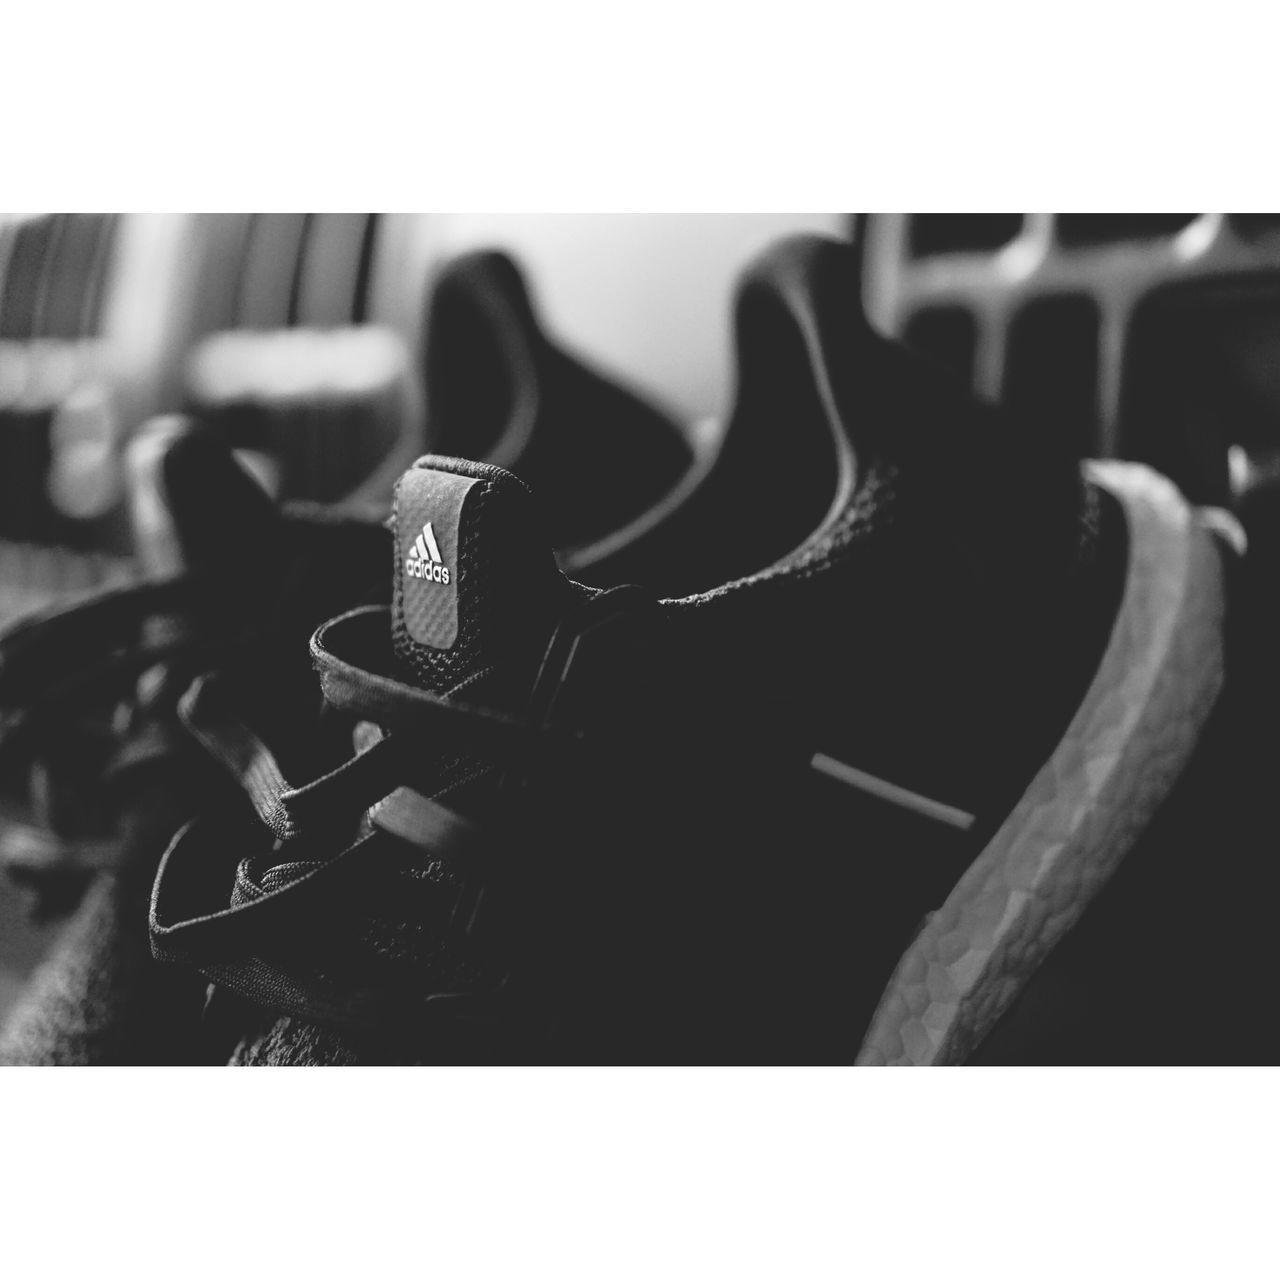 Adidas Adidas_gallery Adidas 4 Life AdidasLover❤ ShoePorn Shoes Of The Day Shoegame Shoelover Shoesaddict Sneakerhead  SneakerFreaks Sneakersaddict Sneakerholics